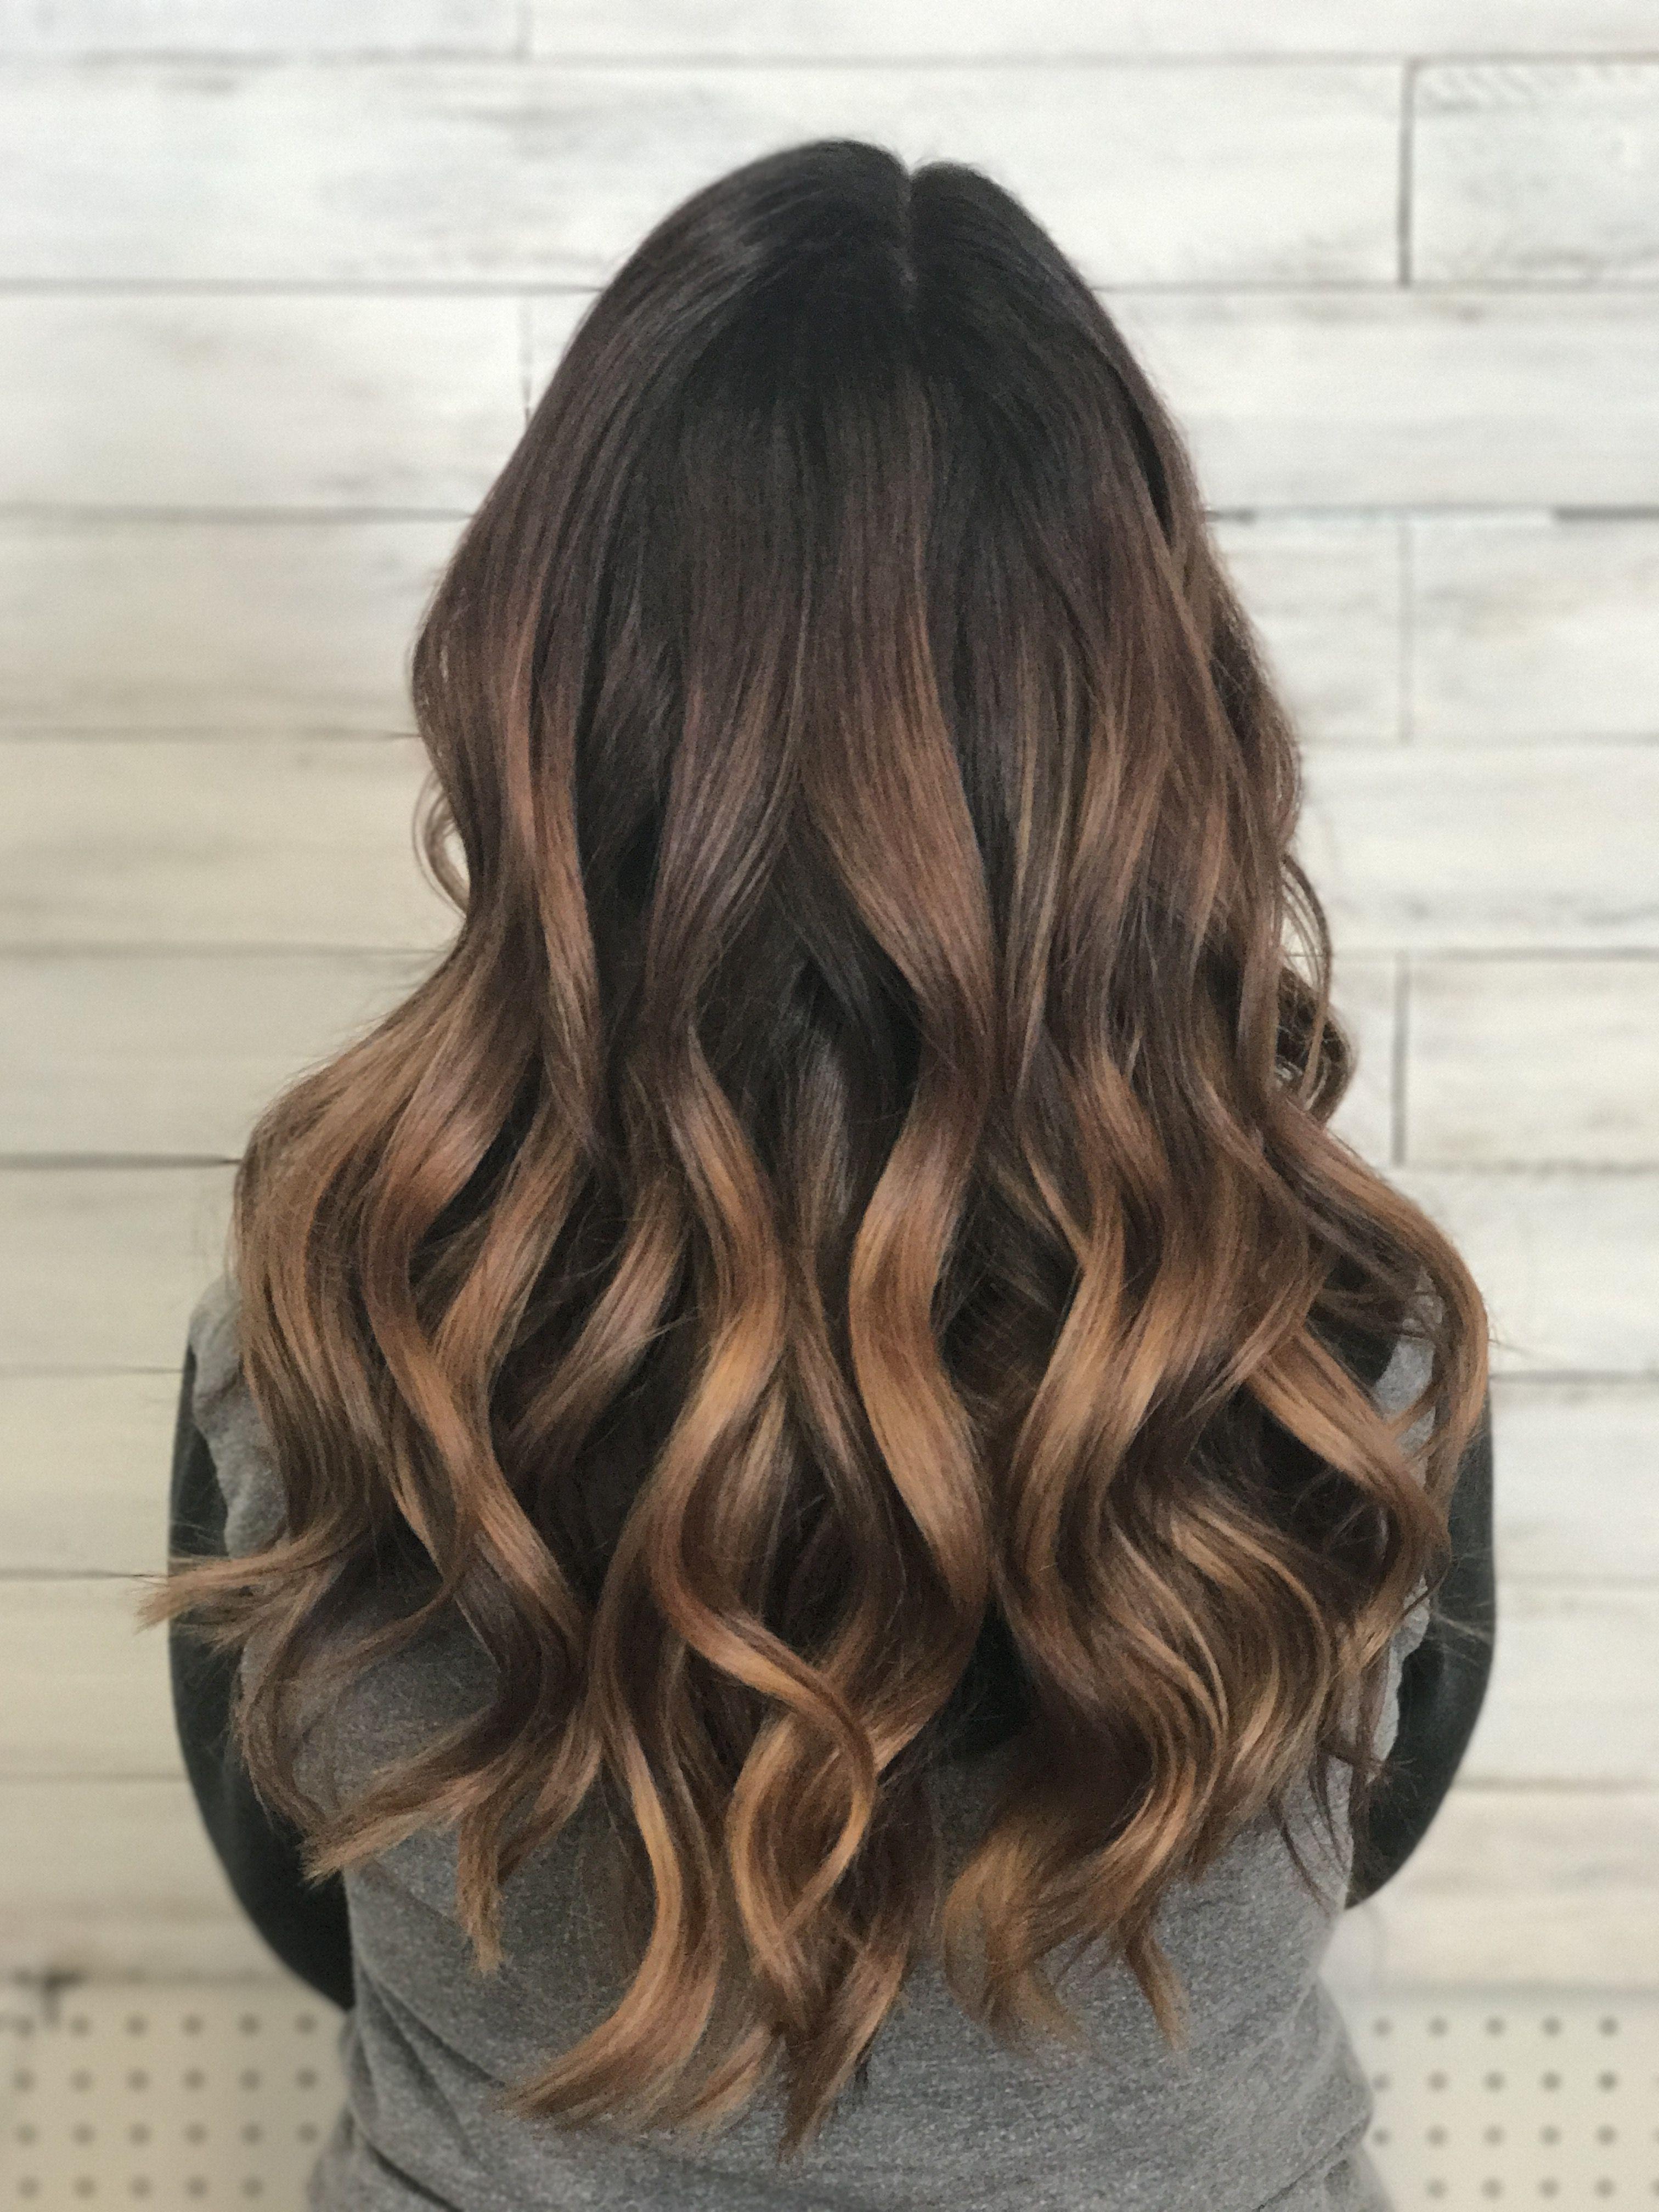 Blonde Hair Balayage Caramel Balayage Caramel Pretty Hair Warm Hair Brown Balayage Balyage Wh Hair Color For Tan Skin Warm Hair Balayage Hair Caramel